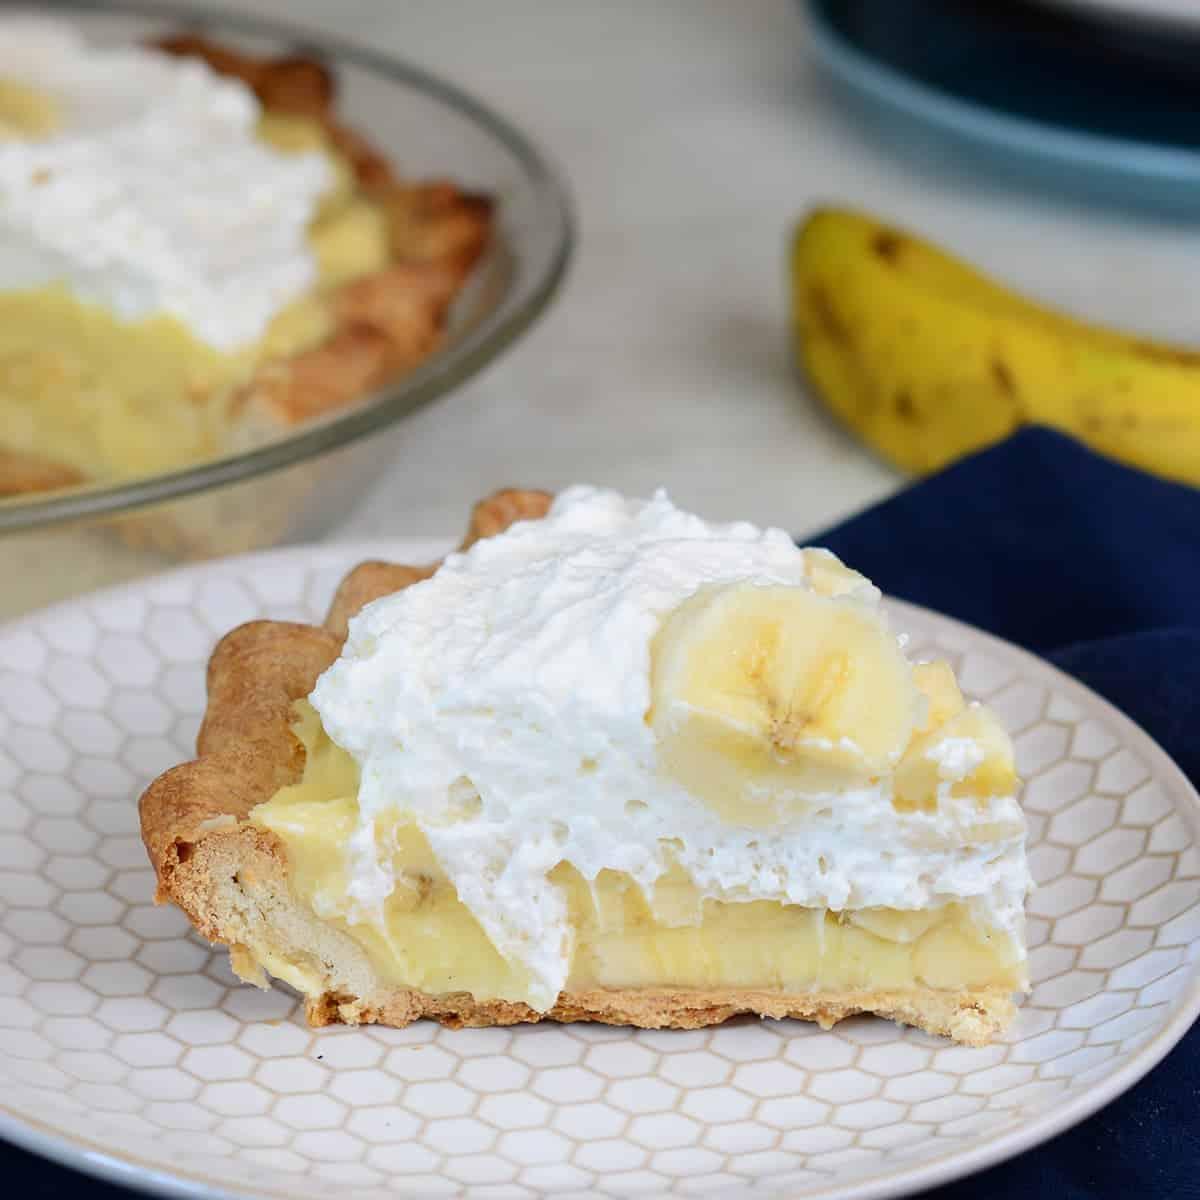 slice of fresh banana cream pie. topped with whipped cream and more fresh bananas.